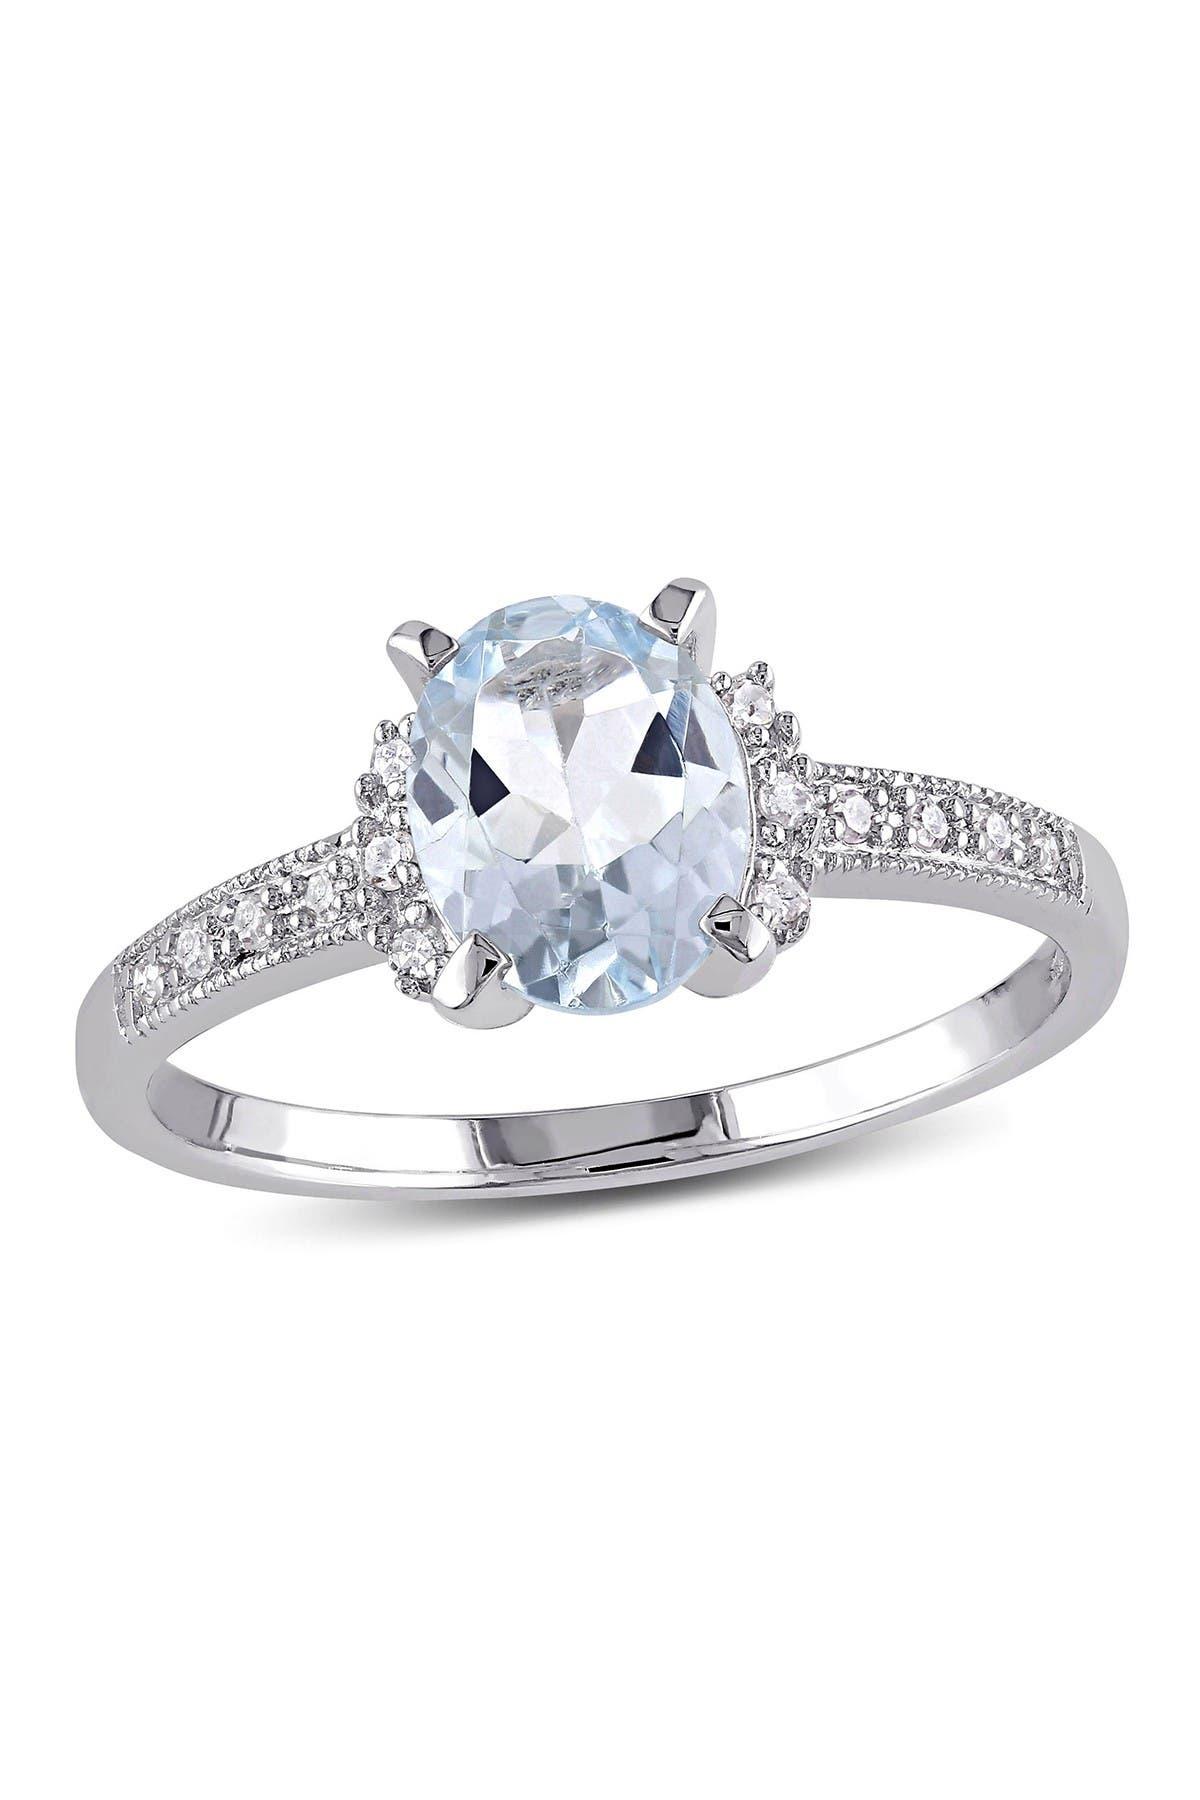 Image of Delmar Sterling Silver Aquamarine & Diamond Fashion Ring